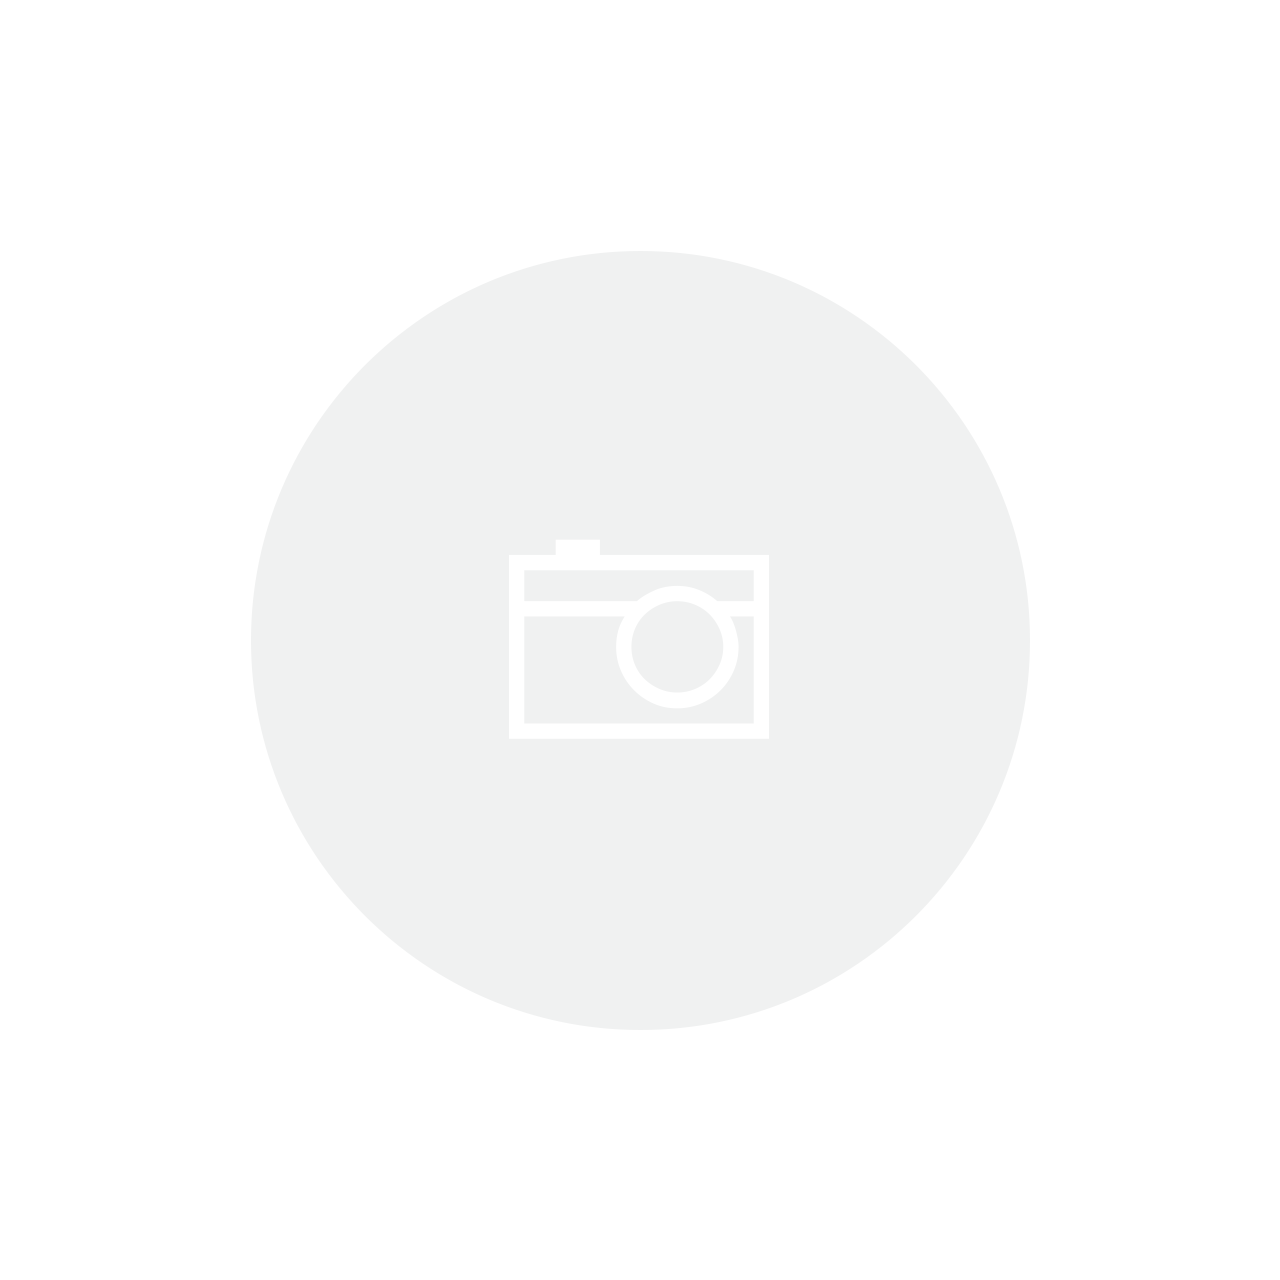 Placa de Vídeo Gigabyte GeForce RTX2060 6GB GDDR6 WindForce OC - GV-N2060WF2OC-6GD